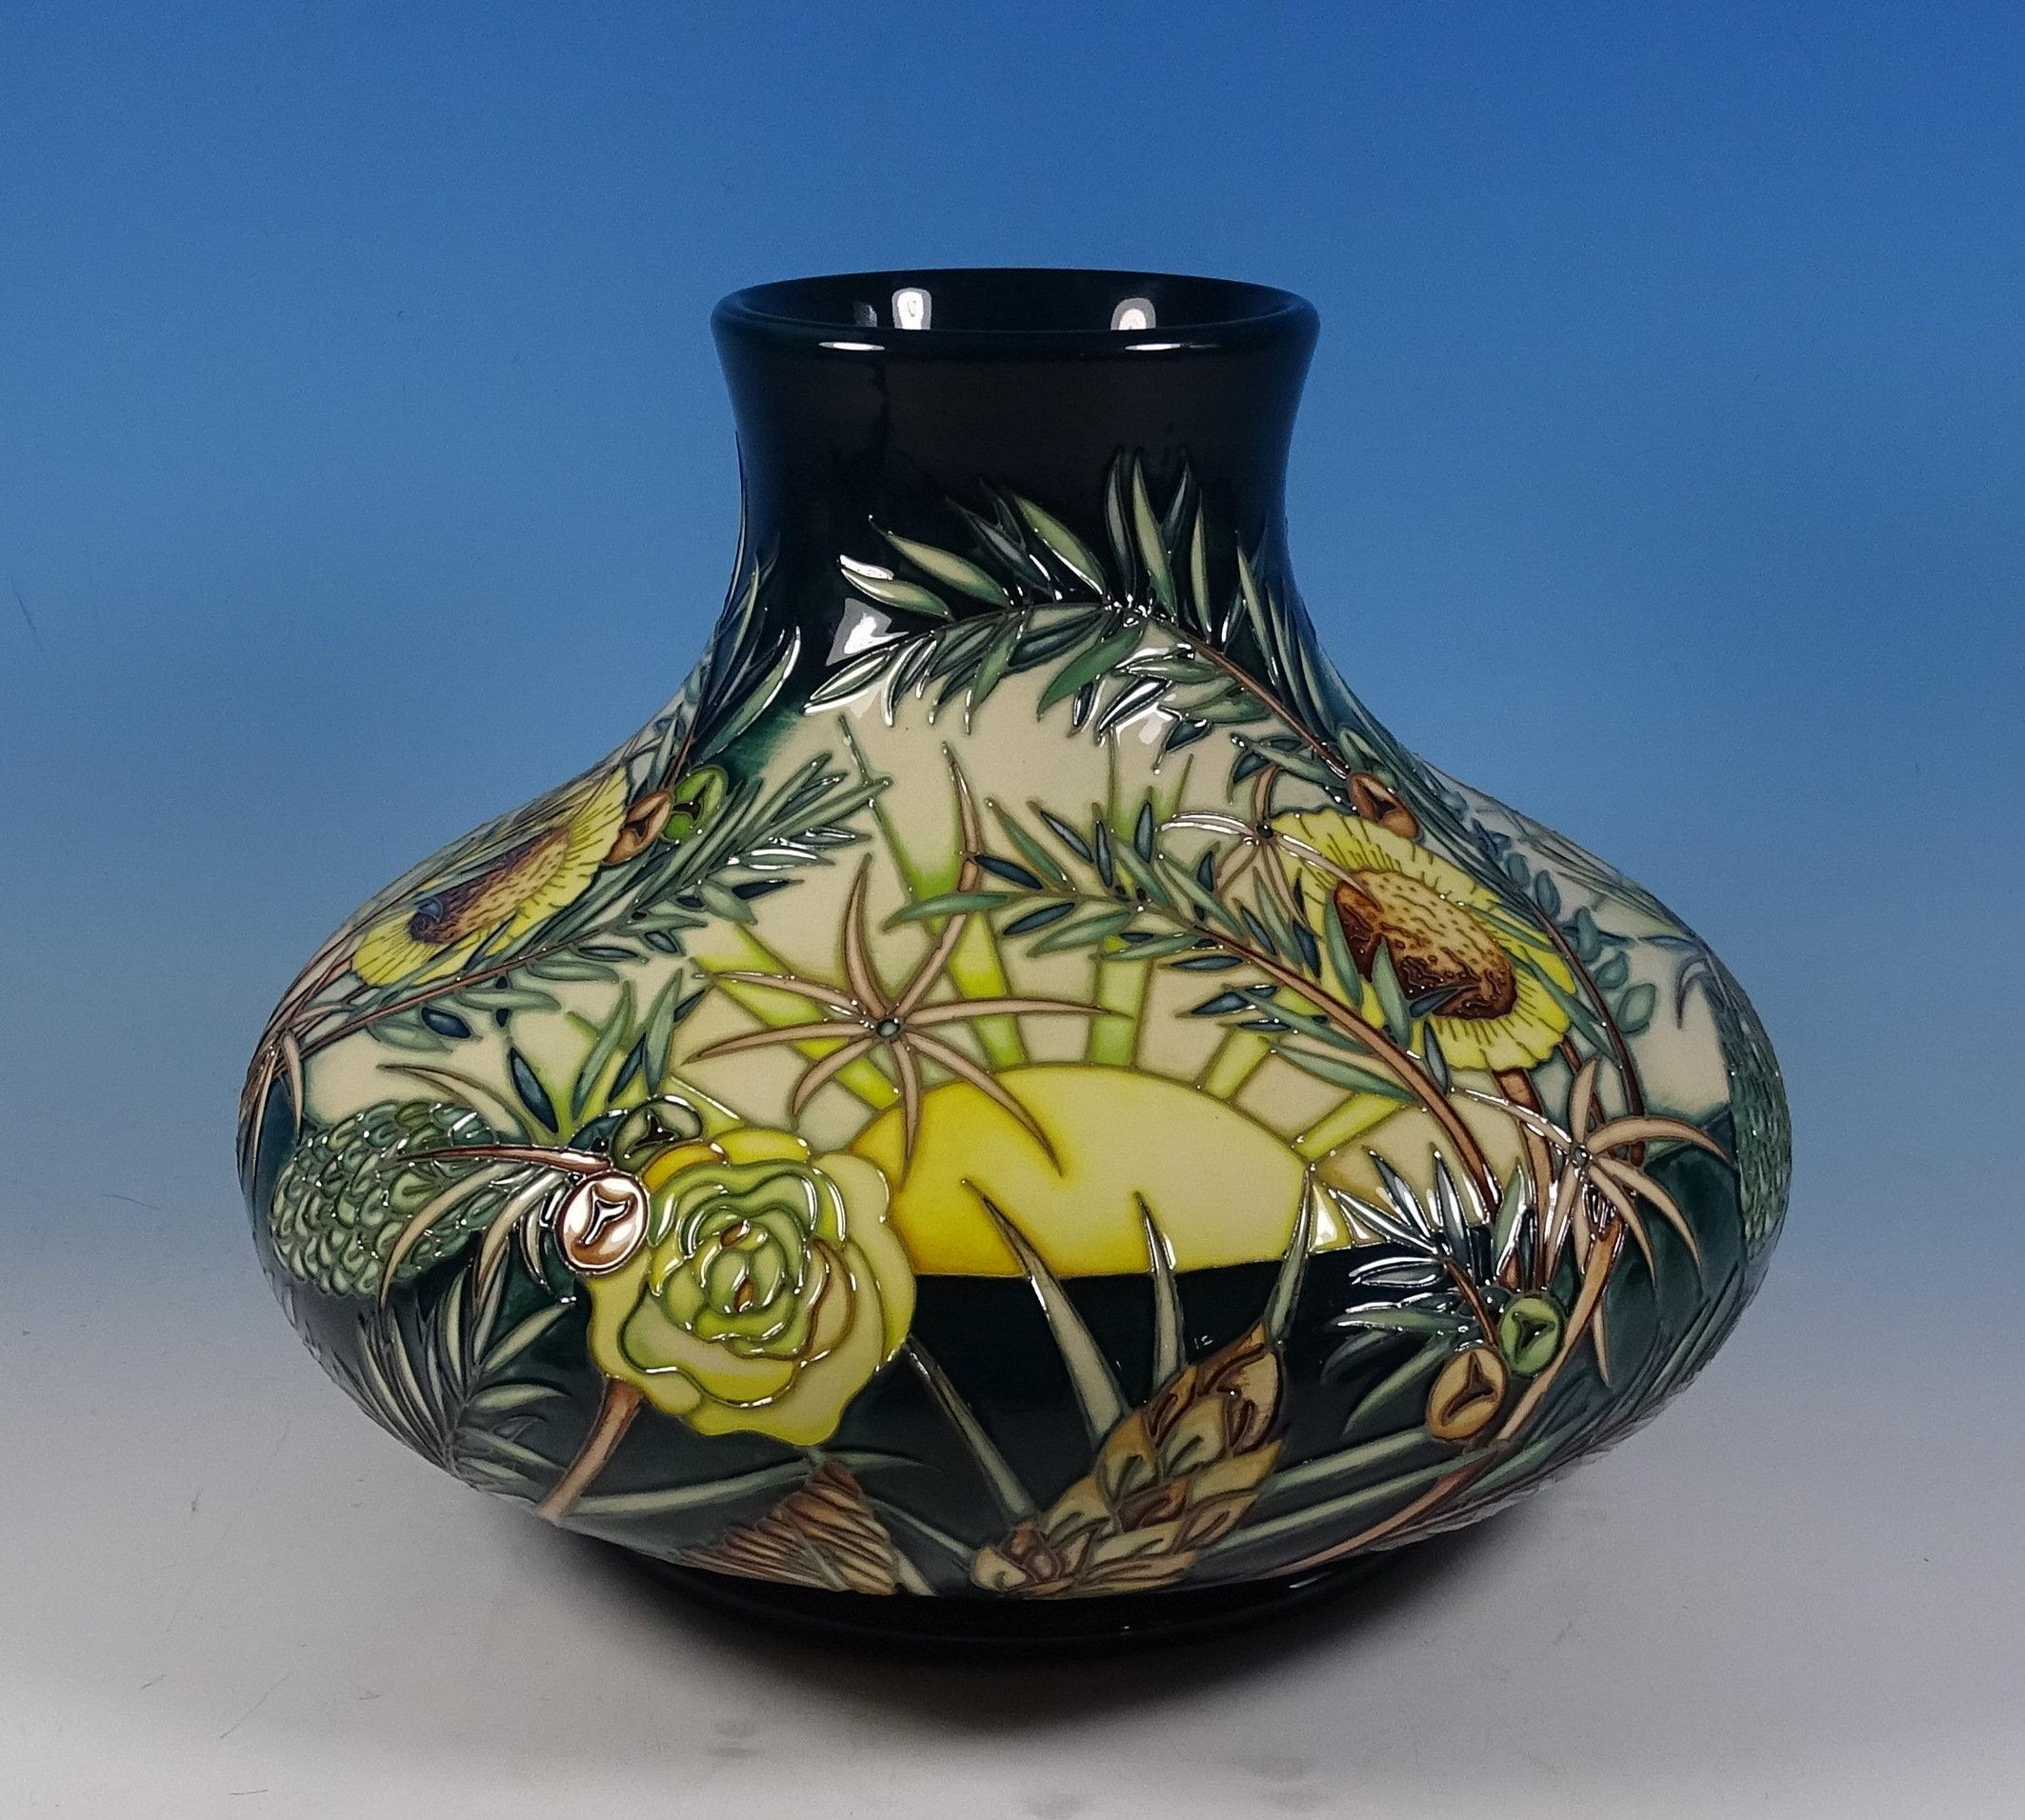 MOORCROFT Designer Score Amazon Dawn 32/10 Vase Nicola Slaney 1st RRP £1630